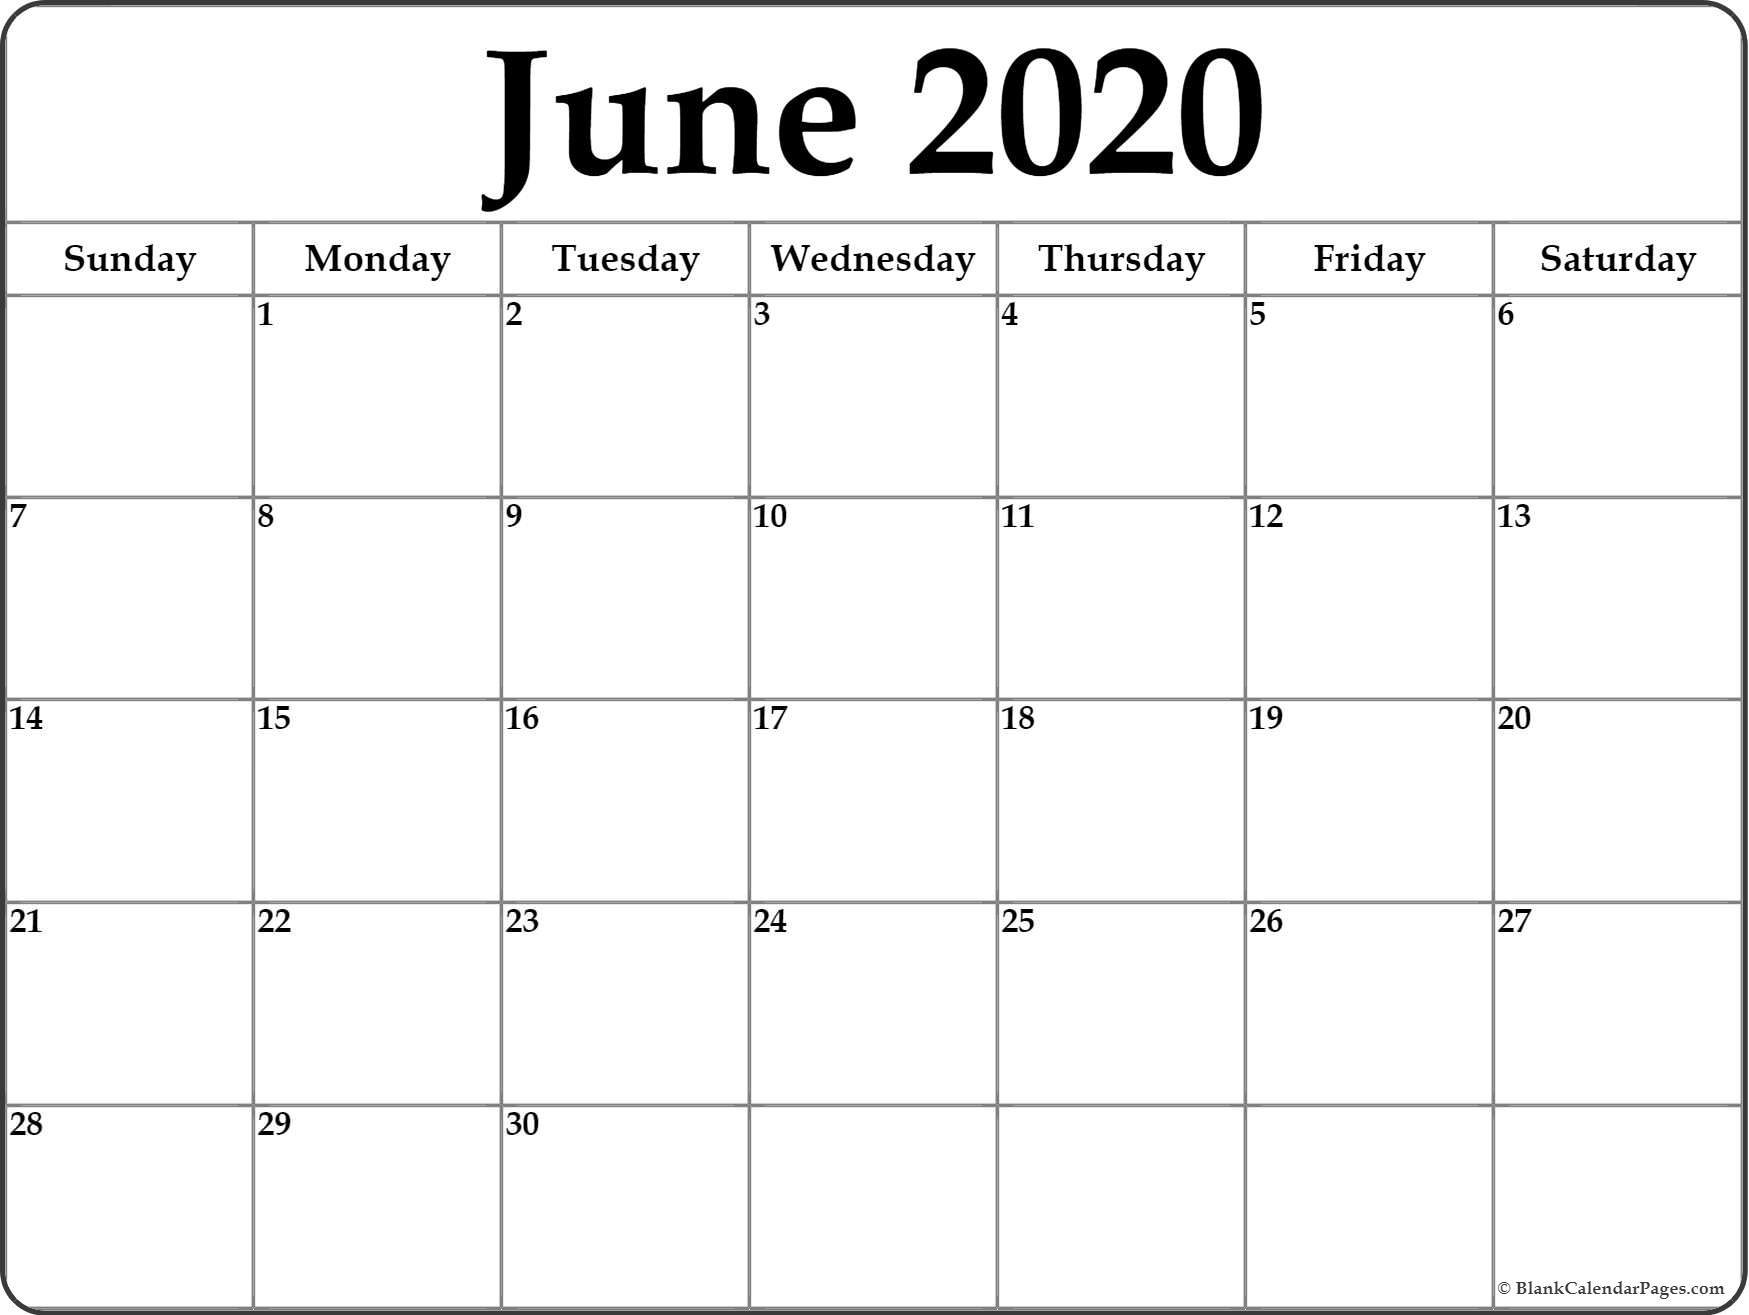 June 2020 Calendar | Free Printable Monthly Calendars-July 2020 Large Claendar Template